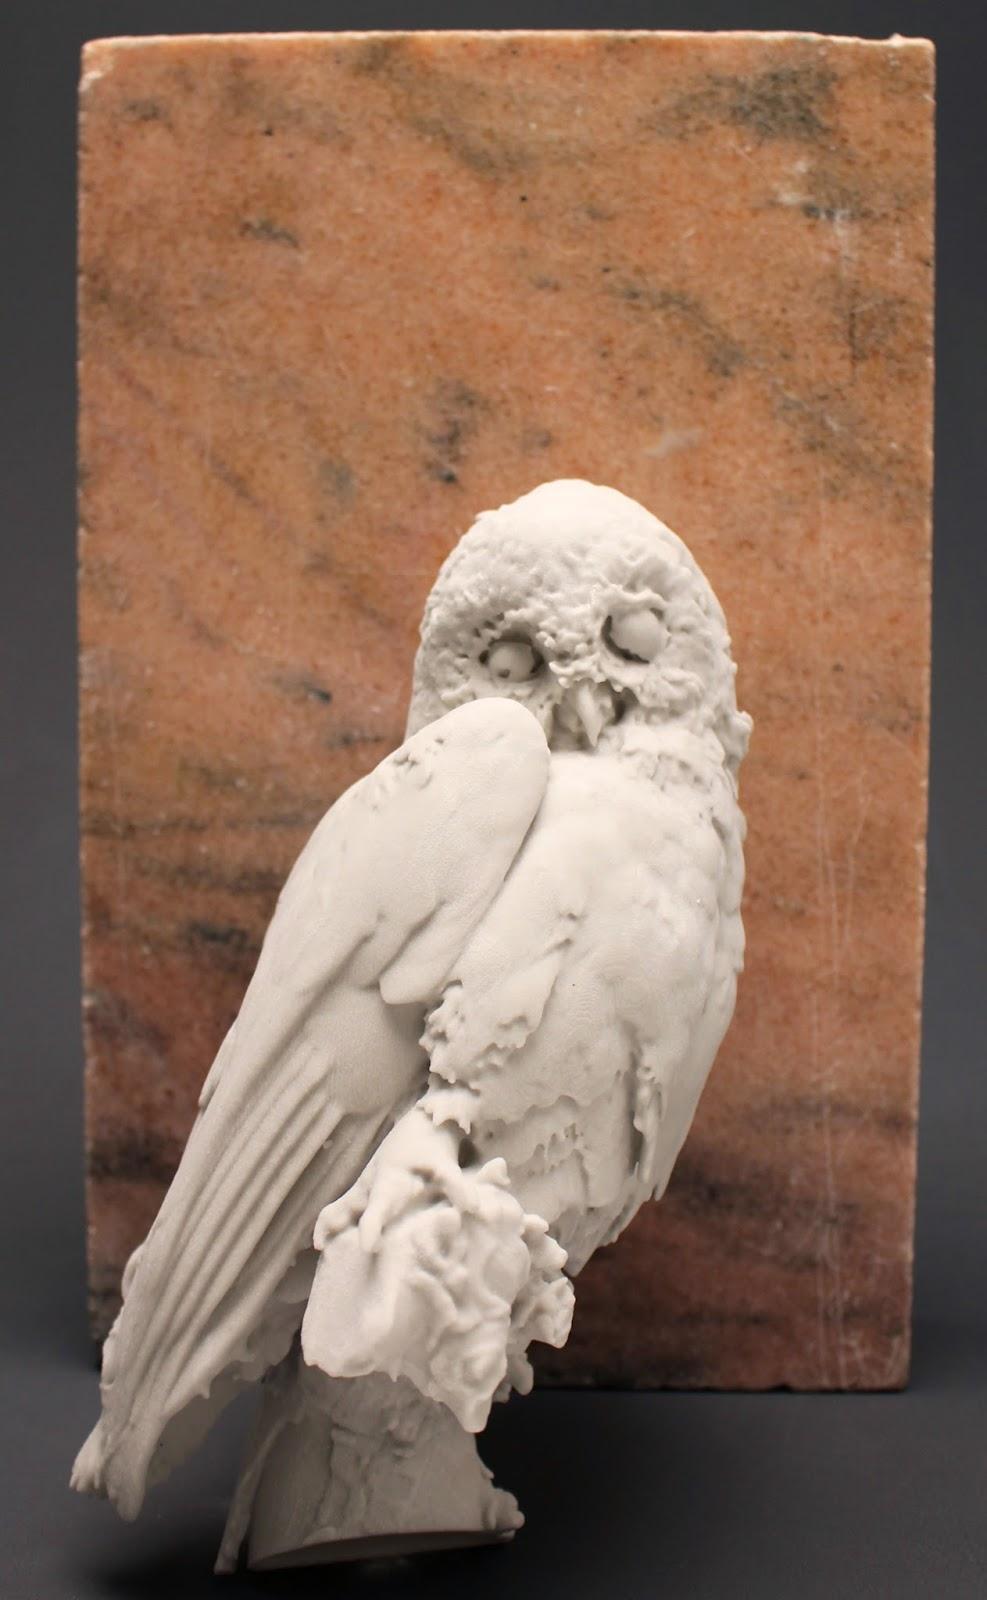 Curious owl haut relief sculpture on a mausoleum flickr